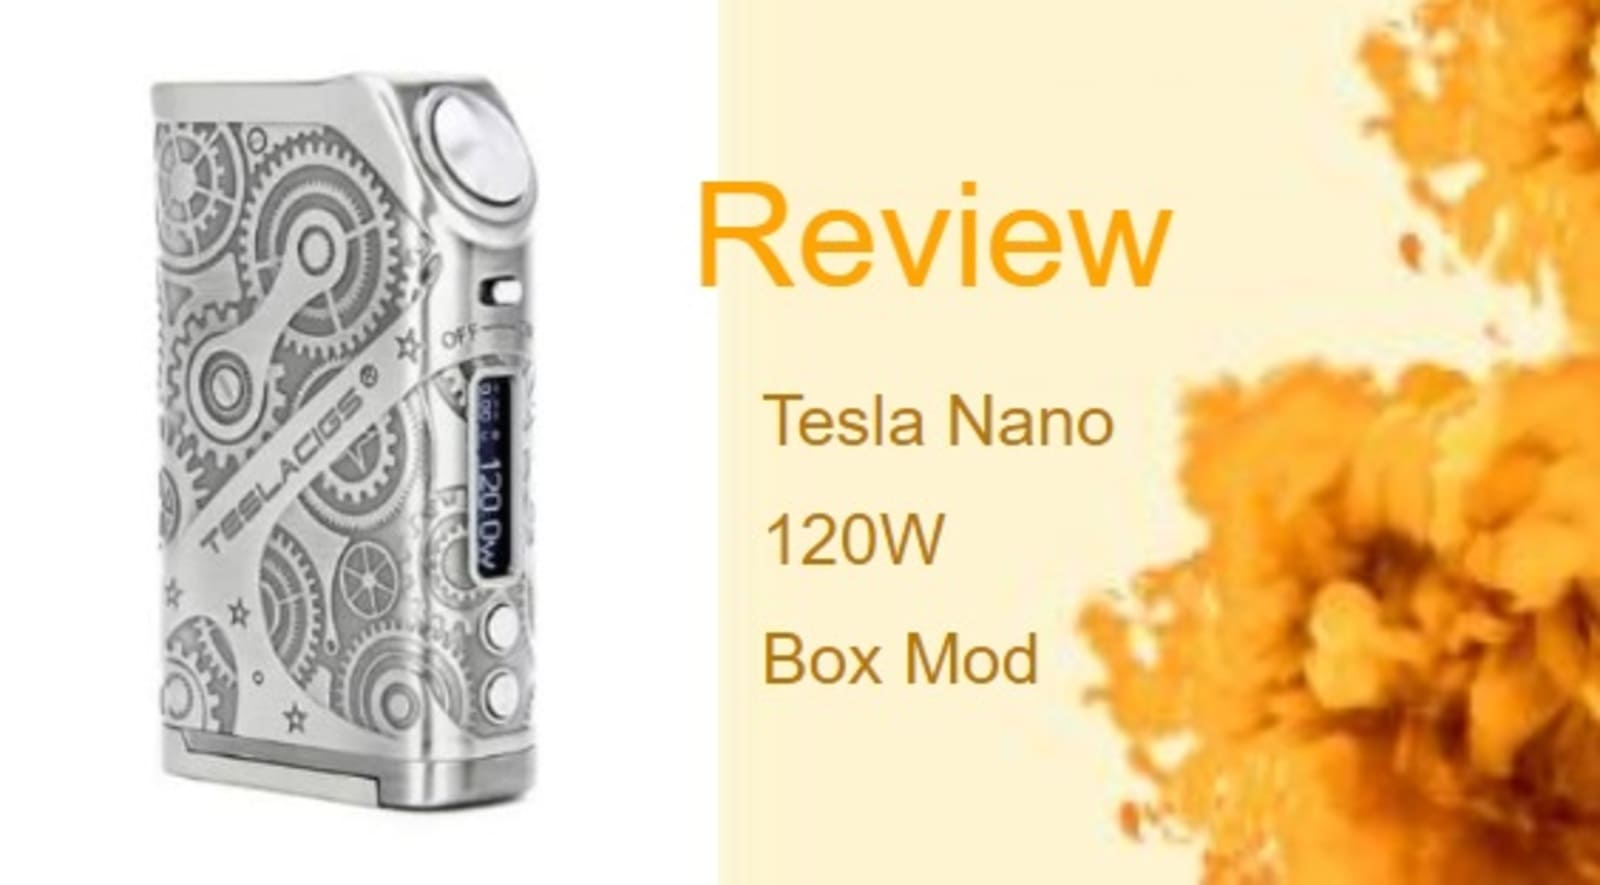 Tesla Nano feature image